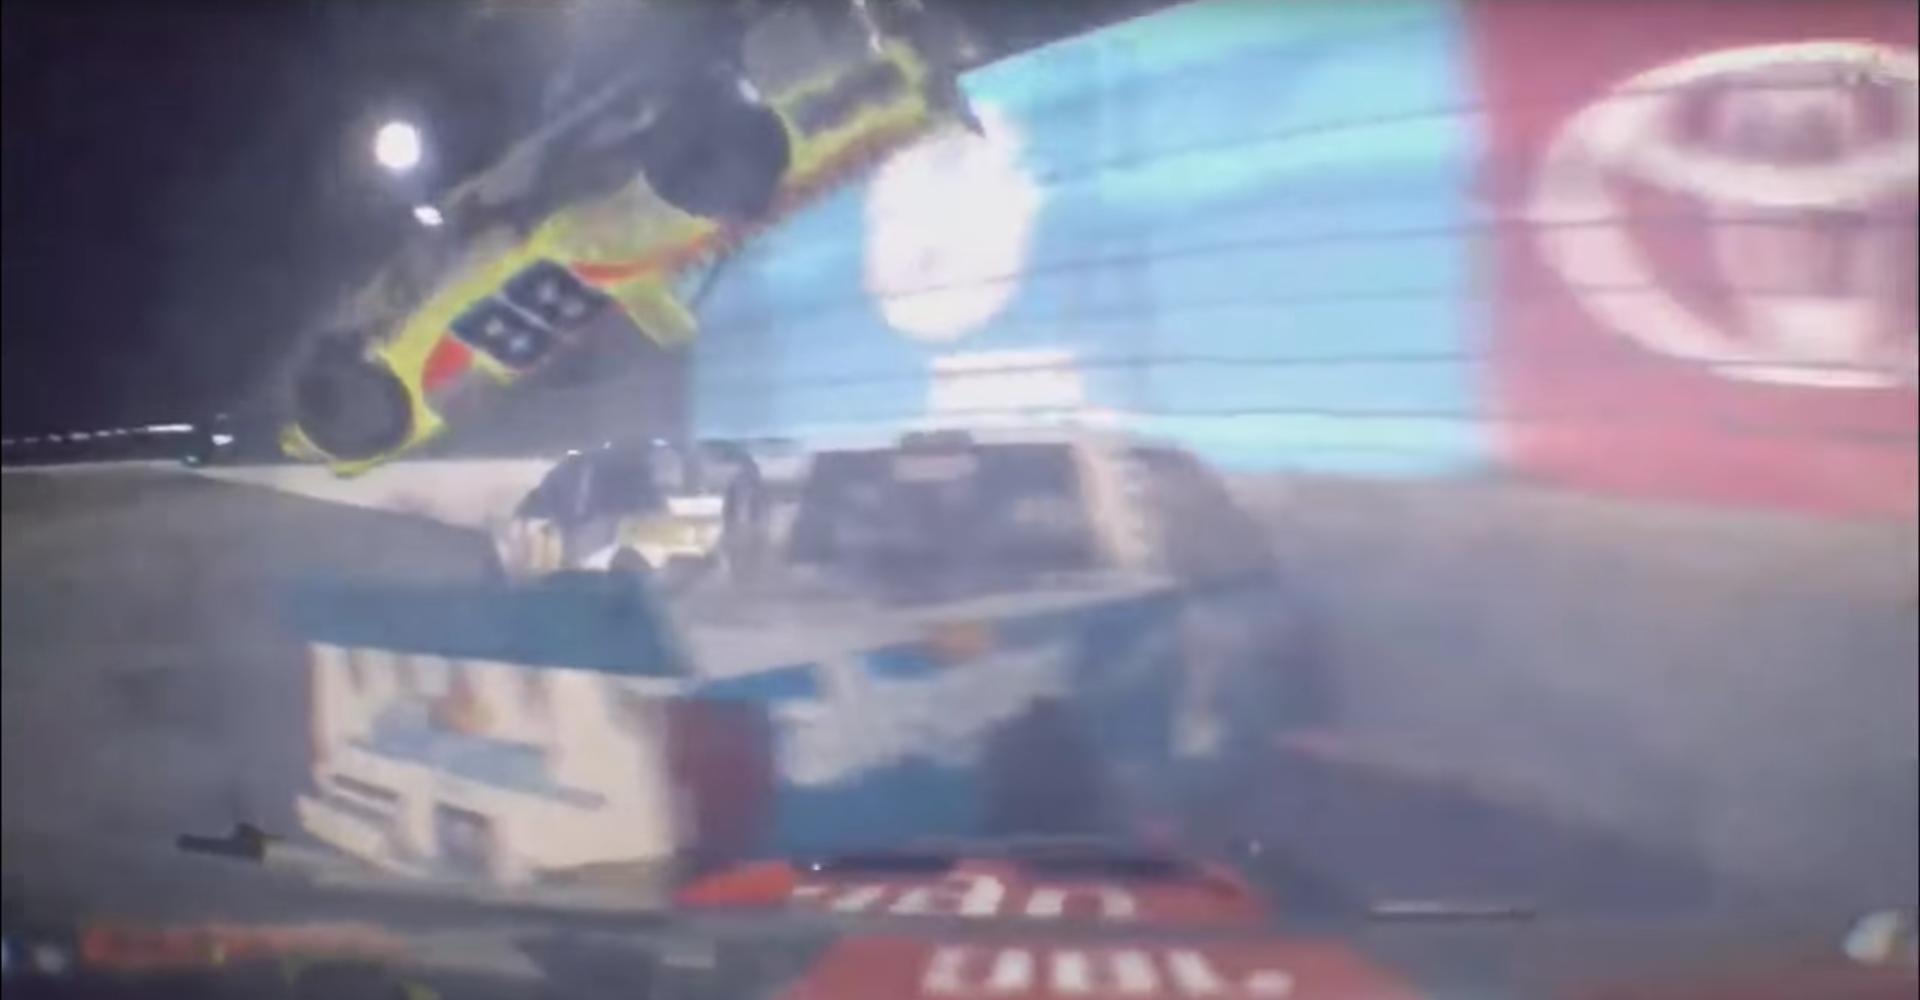 Everyone Escapes Unhurt From This Crazy NASCAR Truck Crash